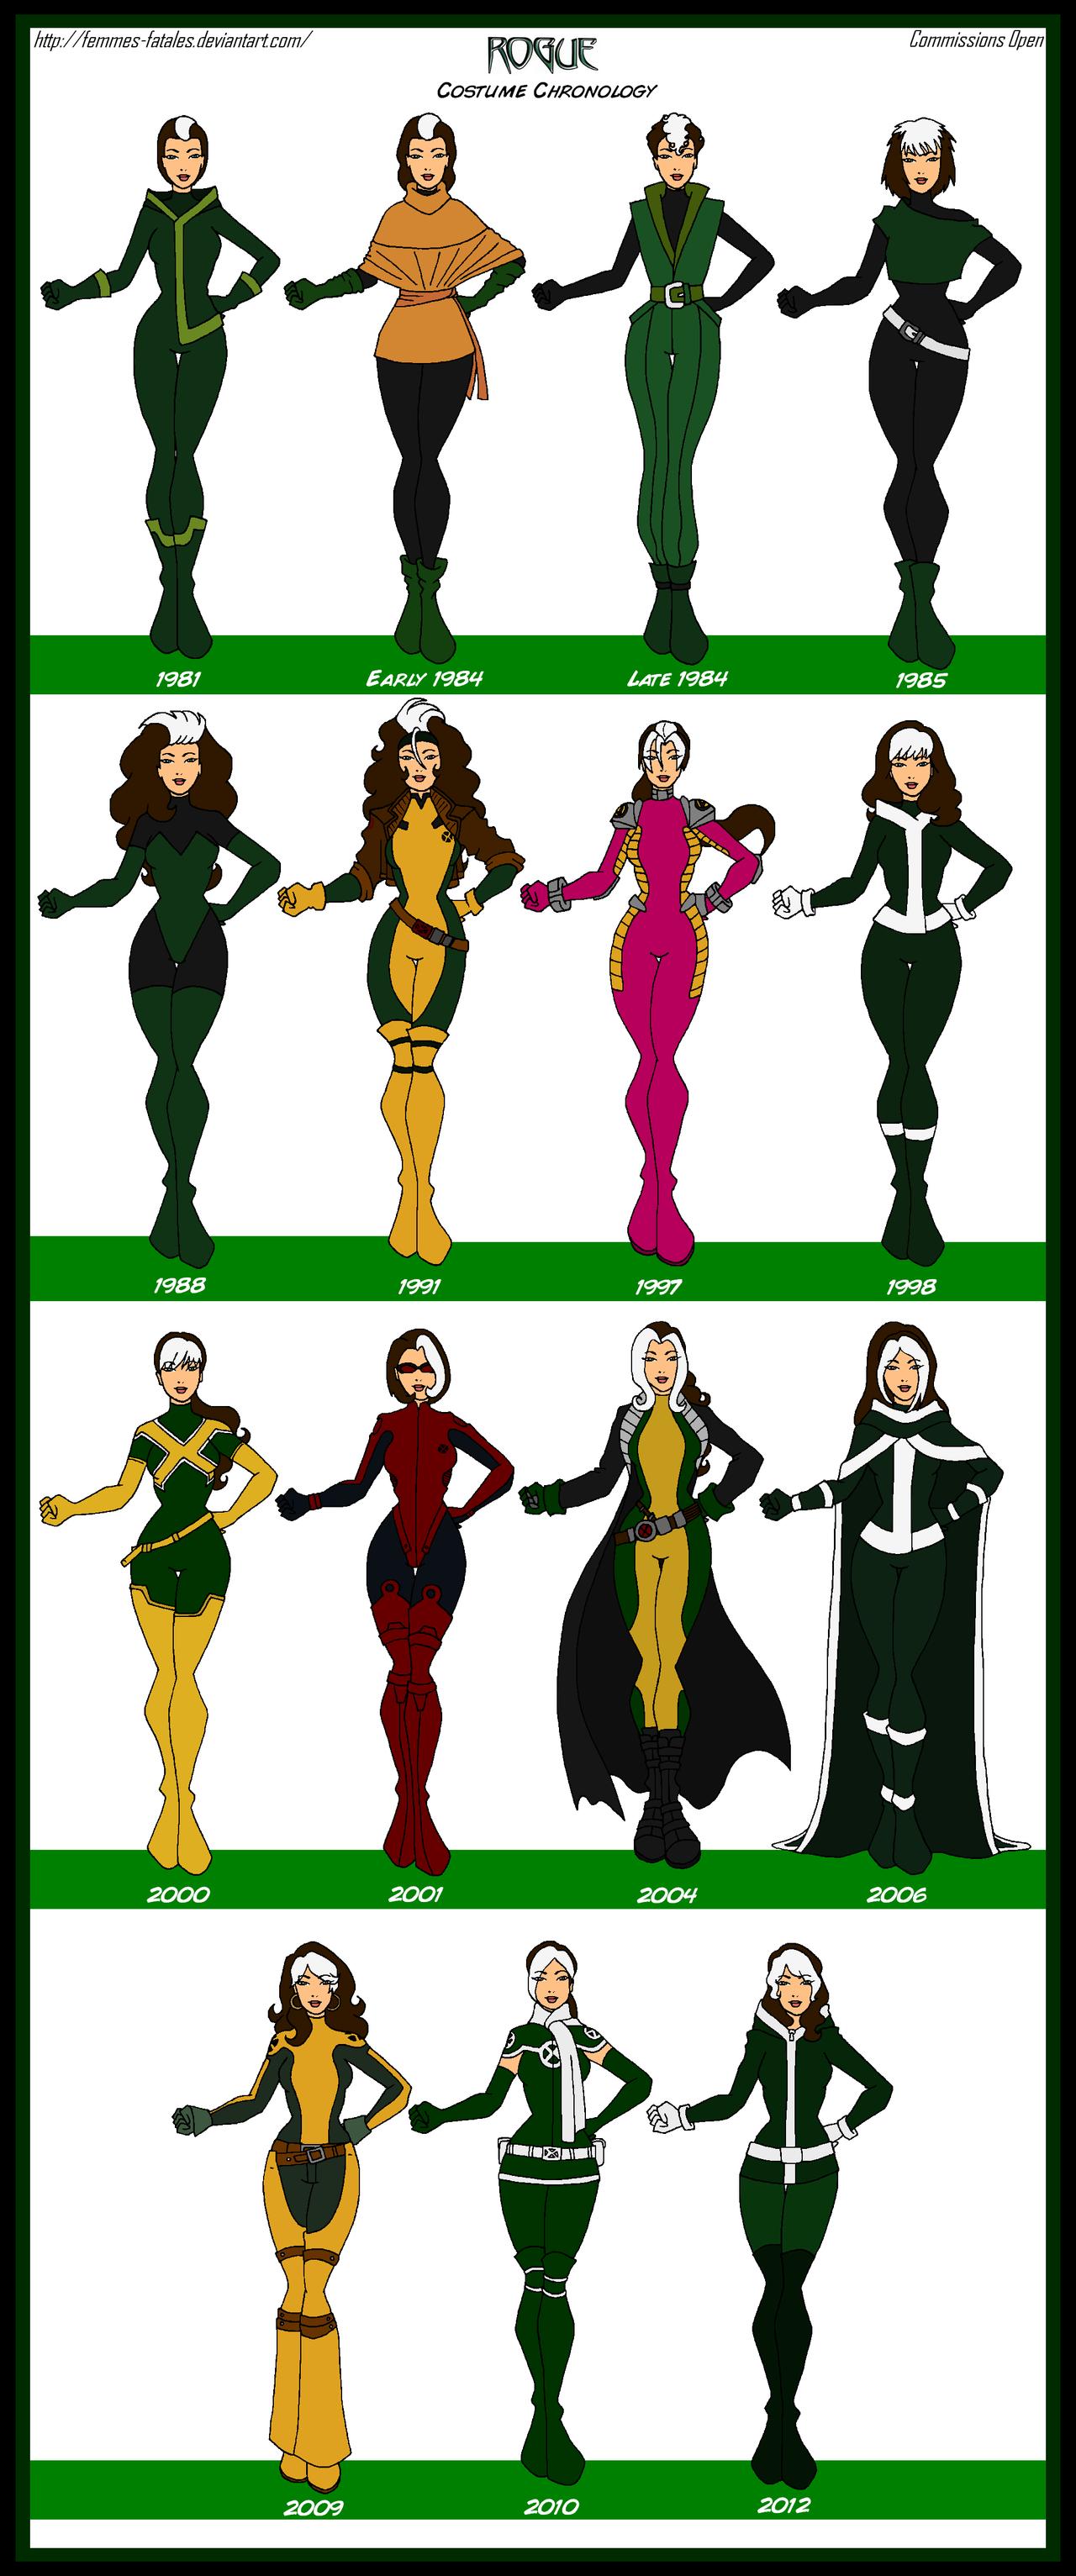 Rogue costume chronology by femmes fatalesiantart on rogue costume chronology by femmes fatalesiantart on deviantart solutioingenieria Gallery